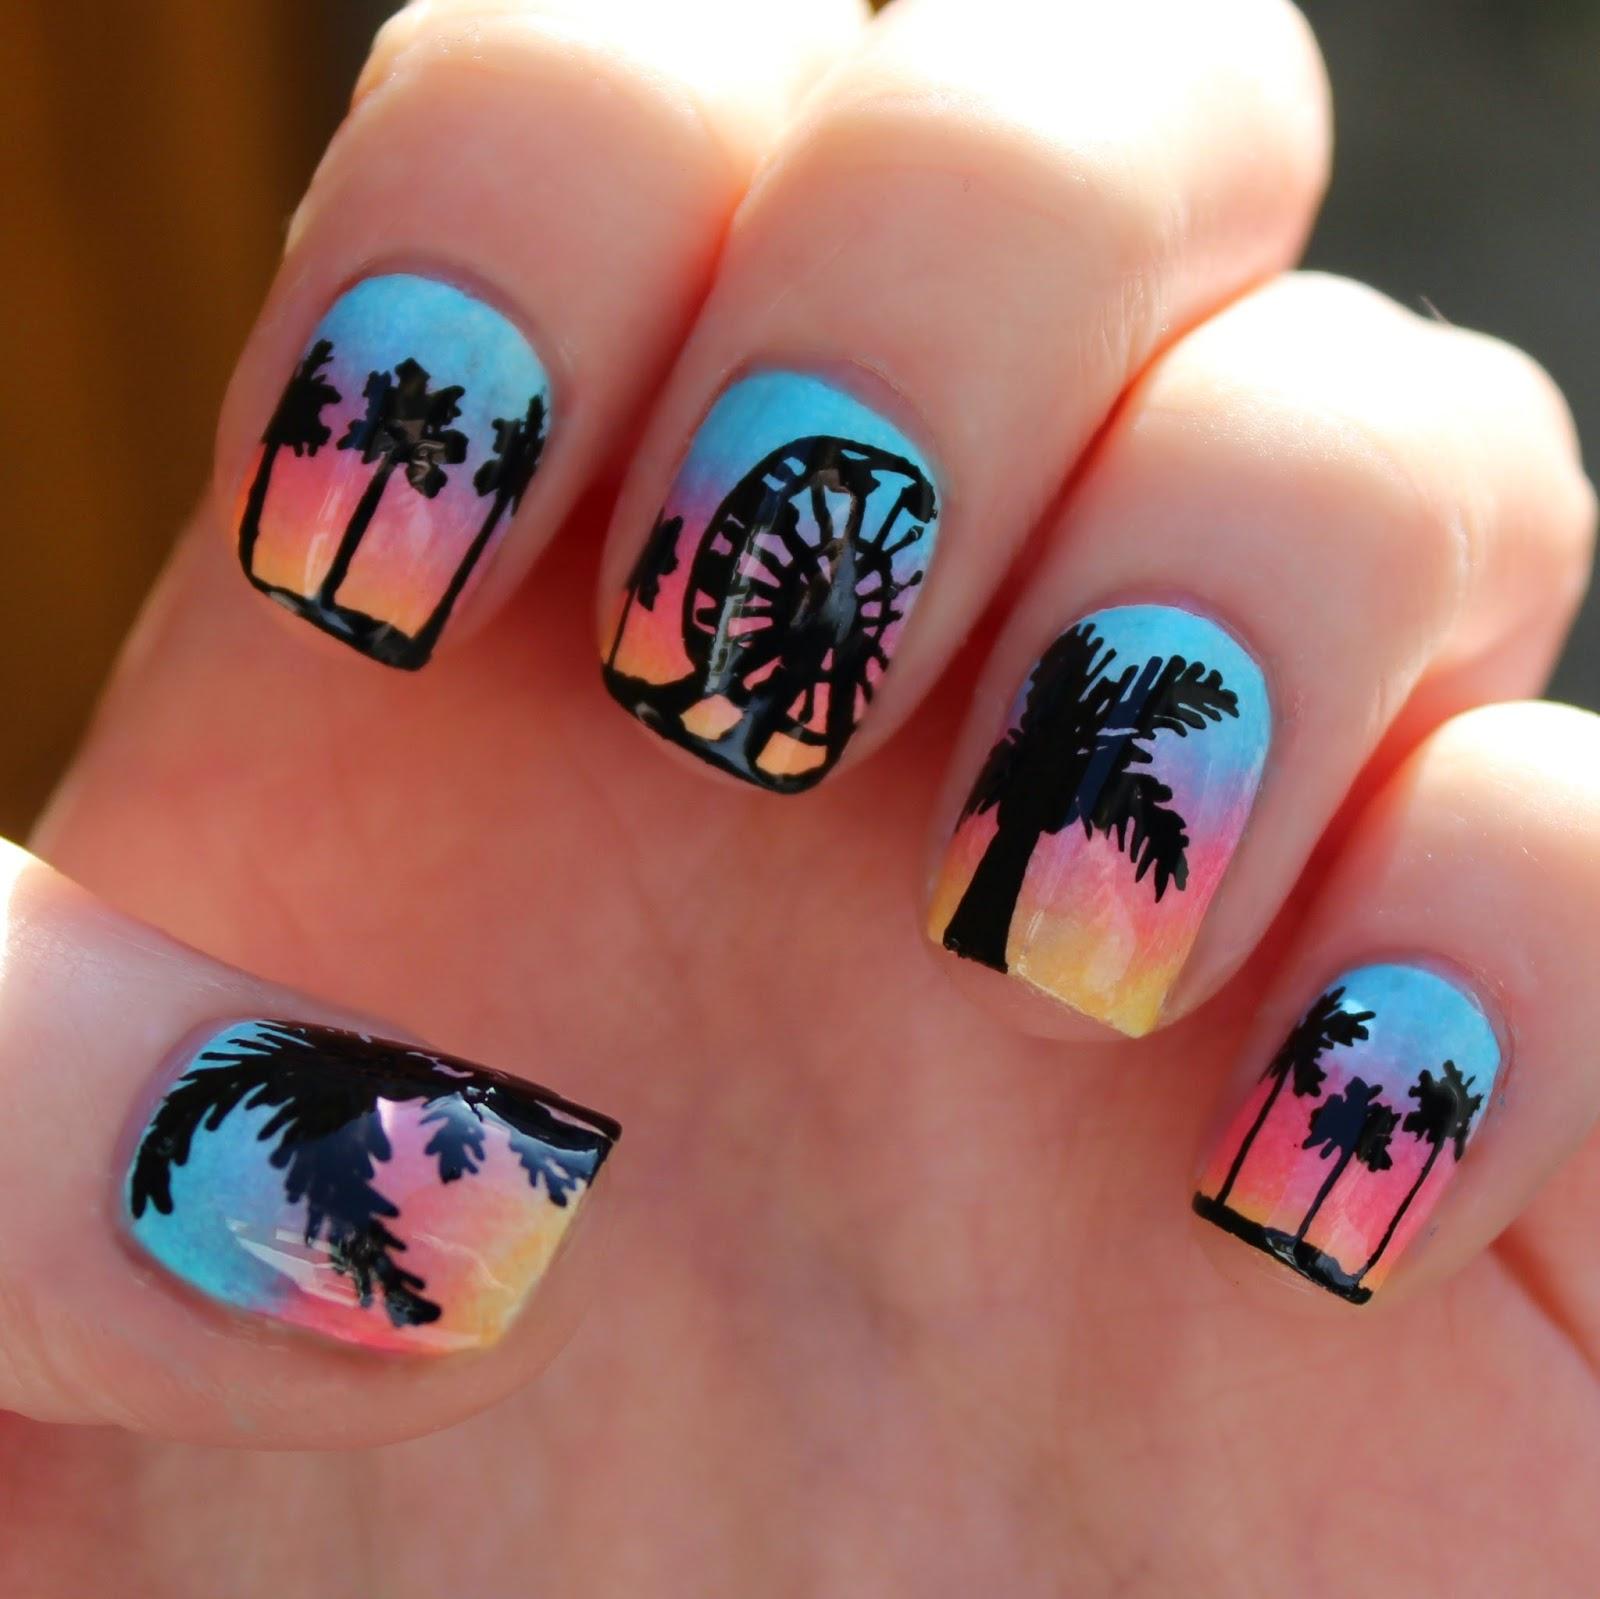 Dahlia Nails Ravenclaw Nail Art: Dahlia Nails: Coachella Nail Art